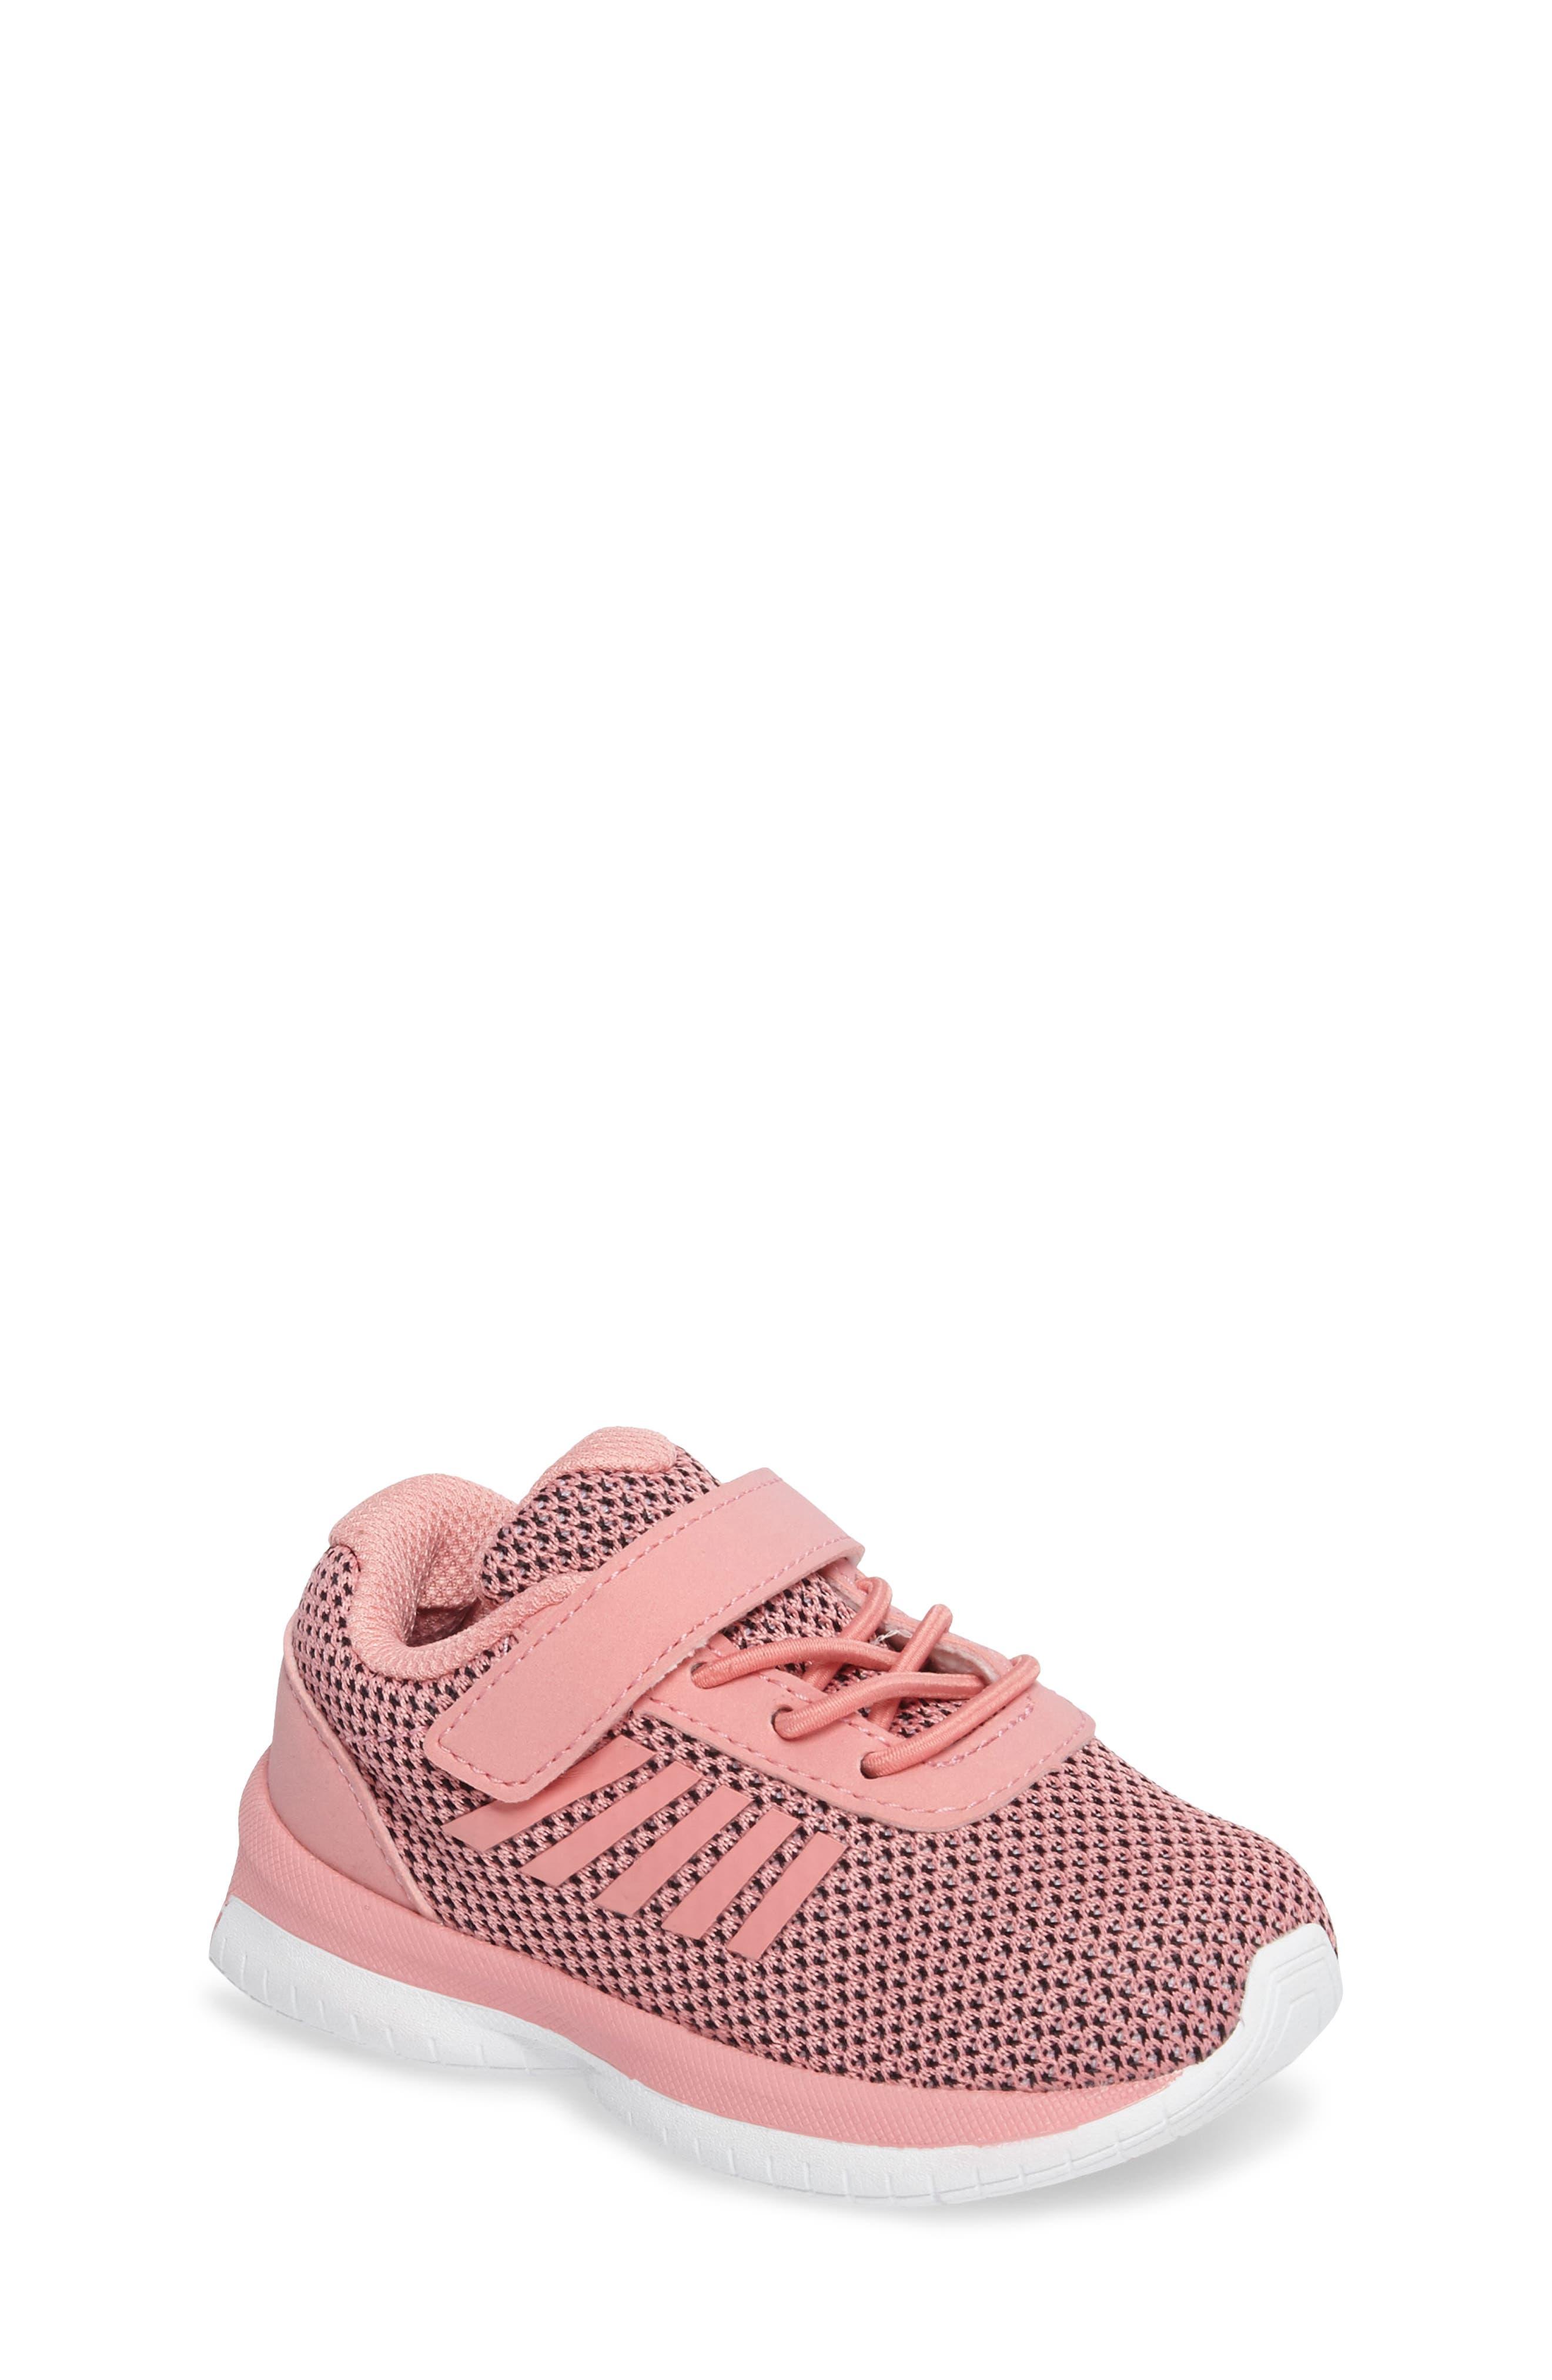 K-Swiss Tubes Infinity Sneaker (Baby, Walker & Toddler)